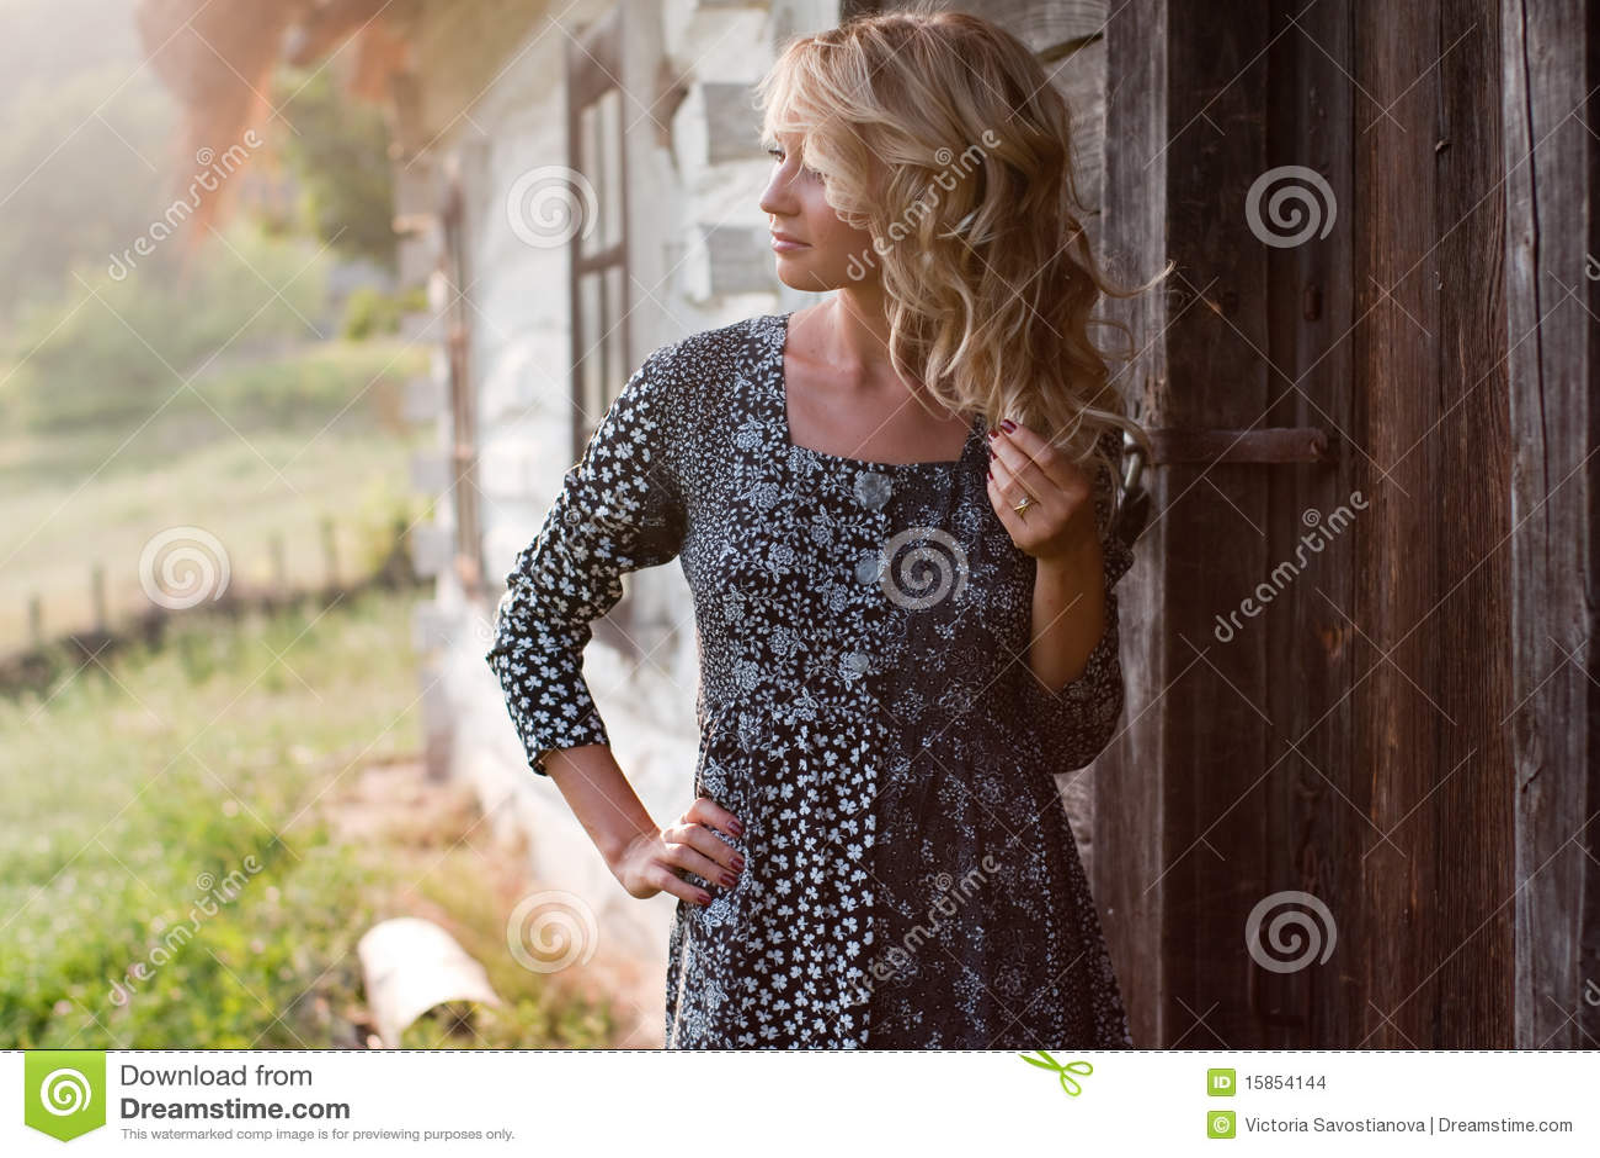 Gorgeous blondie makes old teacher focus on her 8